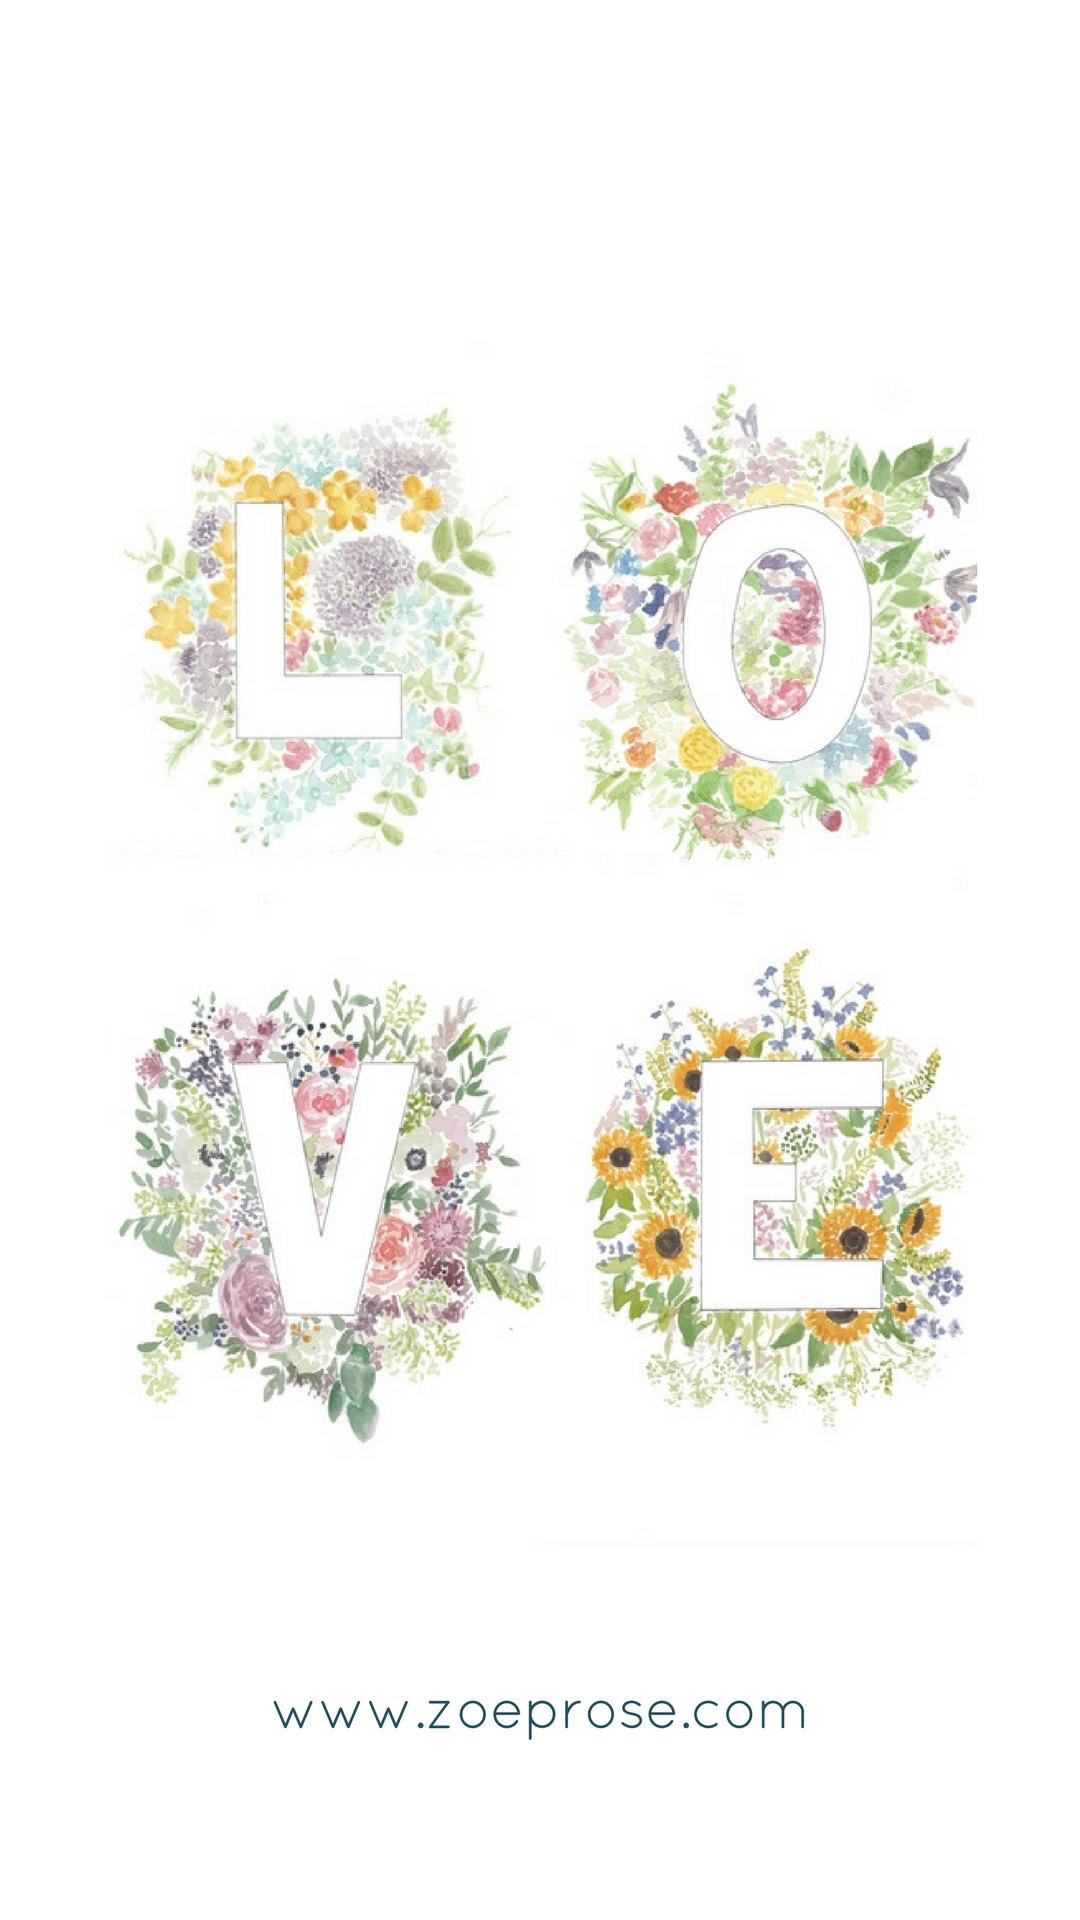 Put on love – and free love lockscreens